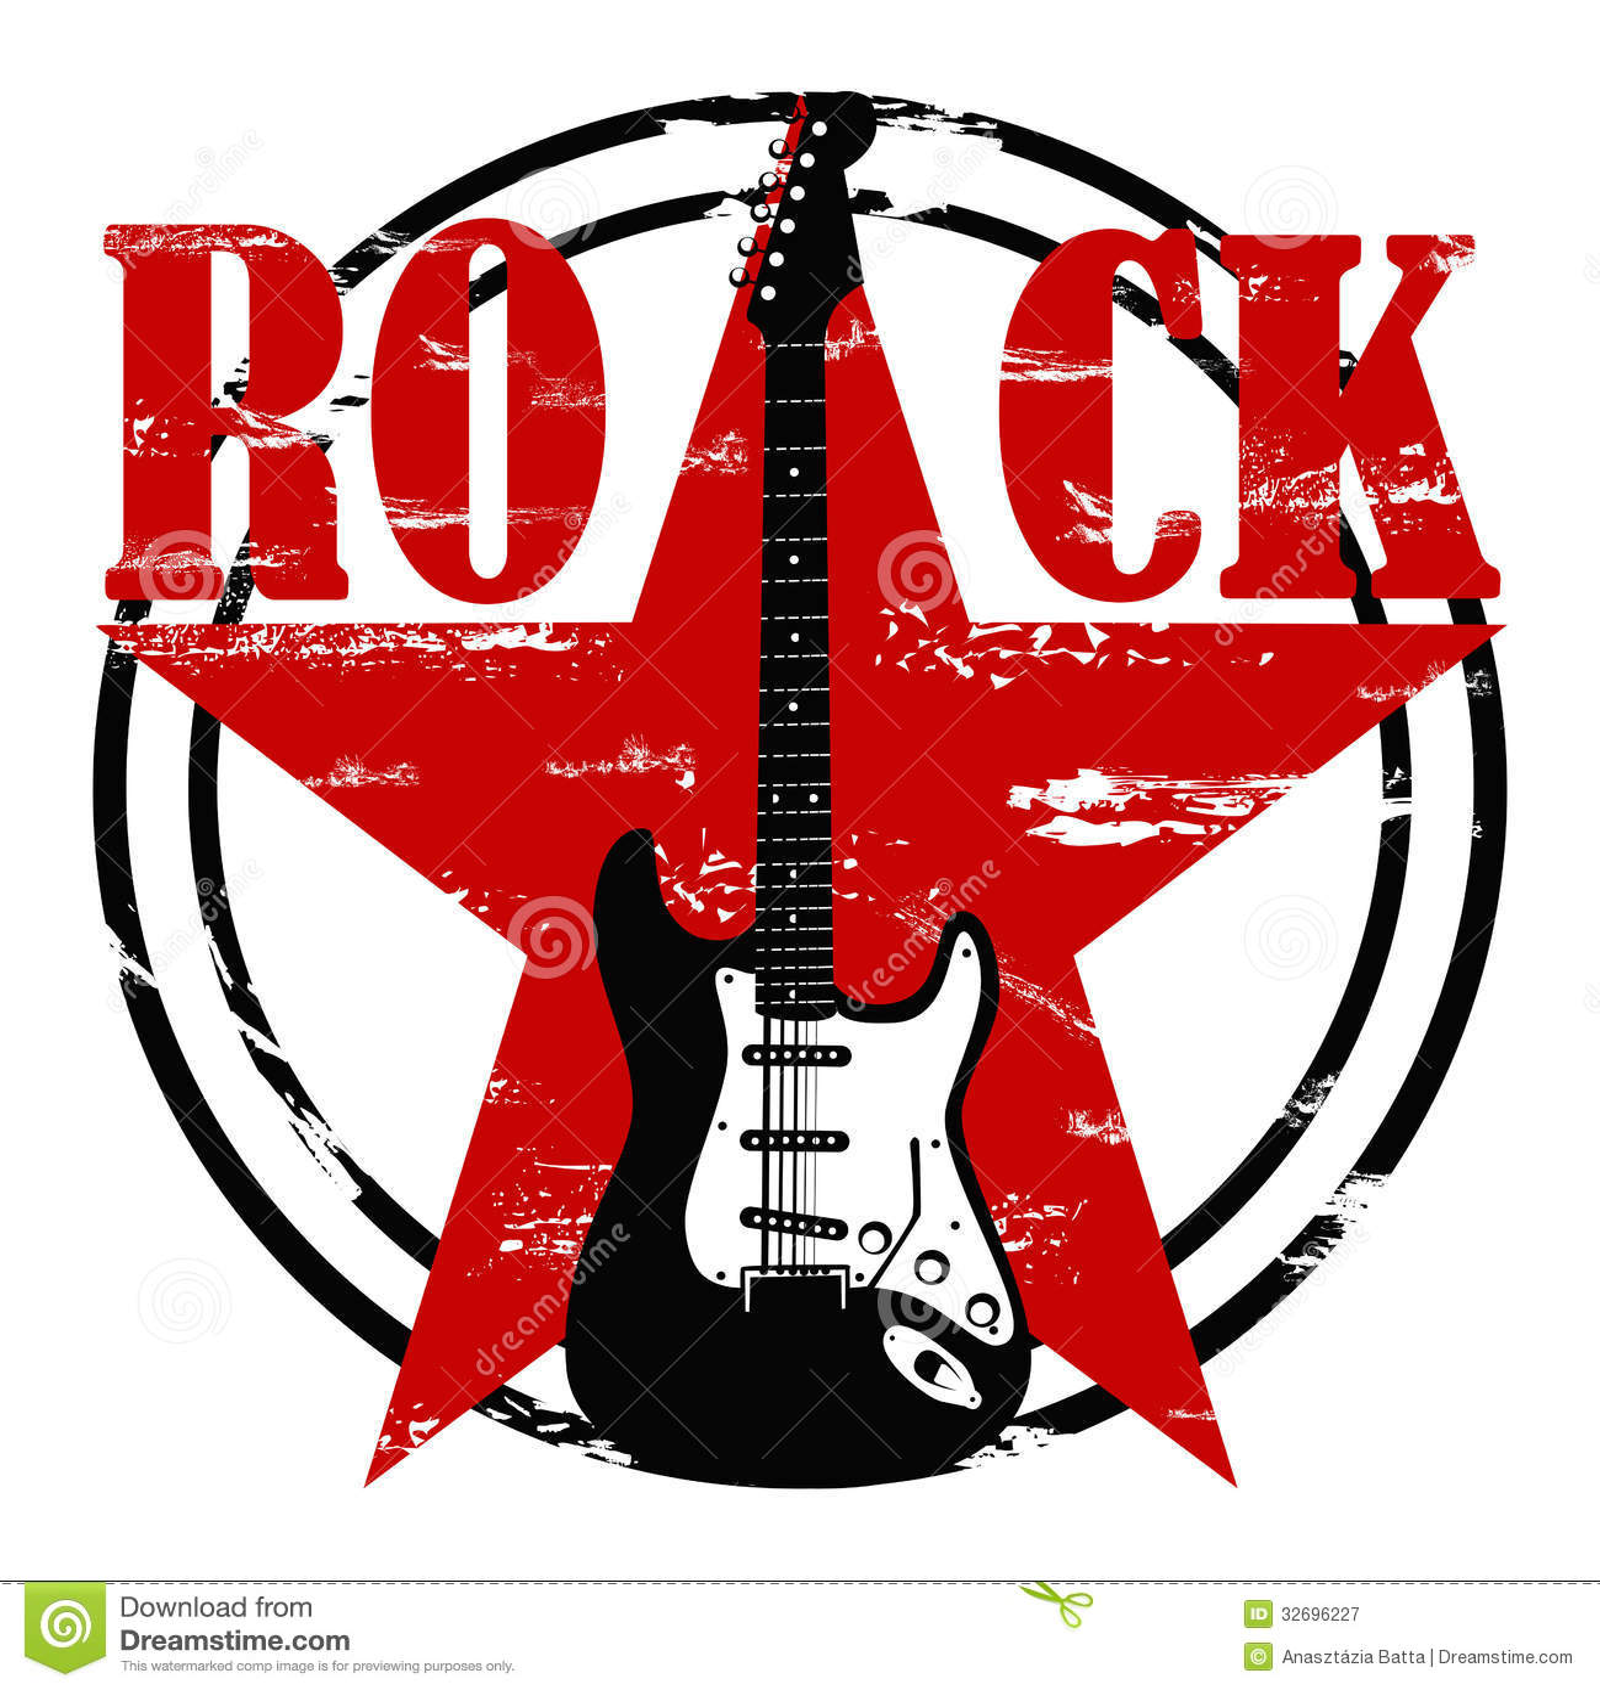 grunge rock royalty free stock photography image 32696227. Black Bedroom Furniture Sets. Home Design Ideas